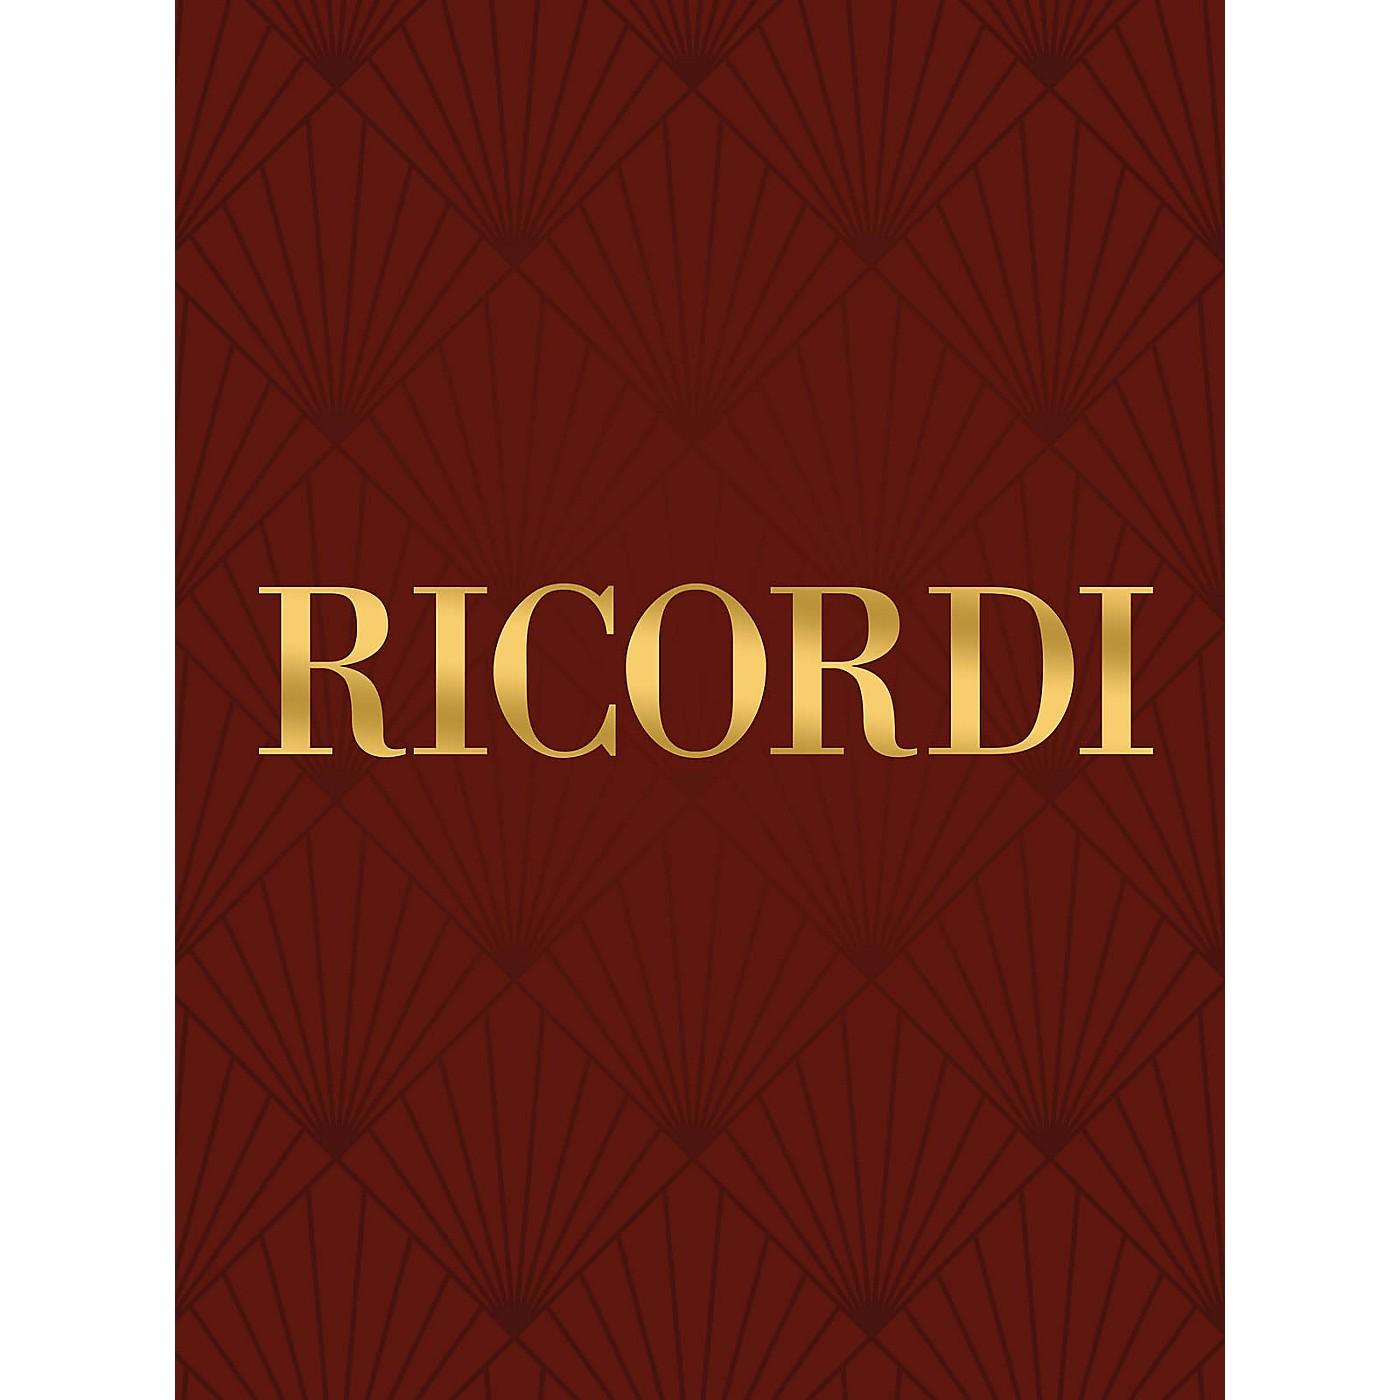 Ricordi Manon Lescaut (Vocal Score) Vocal Score Series Composed by Giacomo Puccini Edited by Mawbray Marras thumbnail